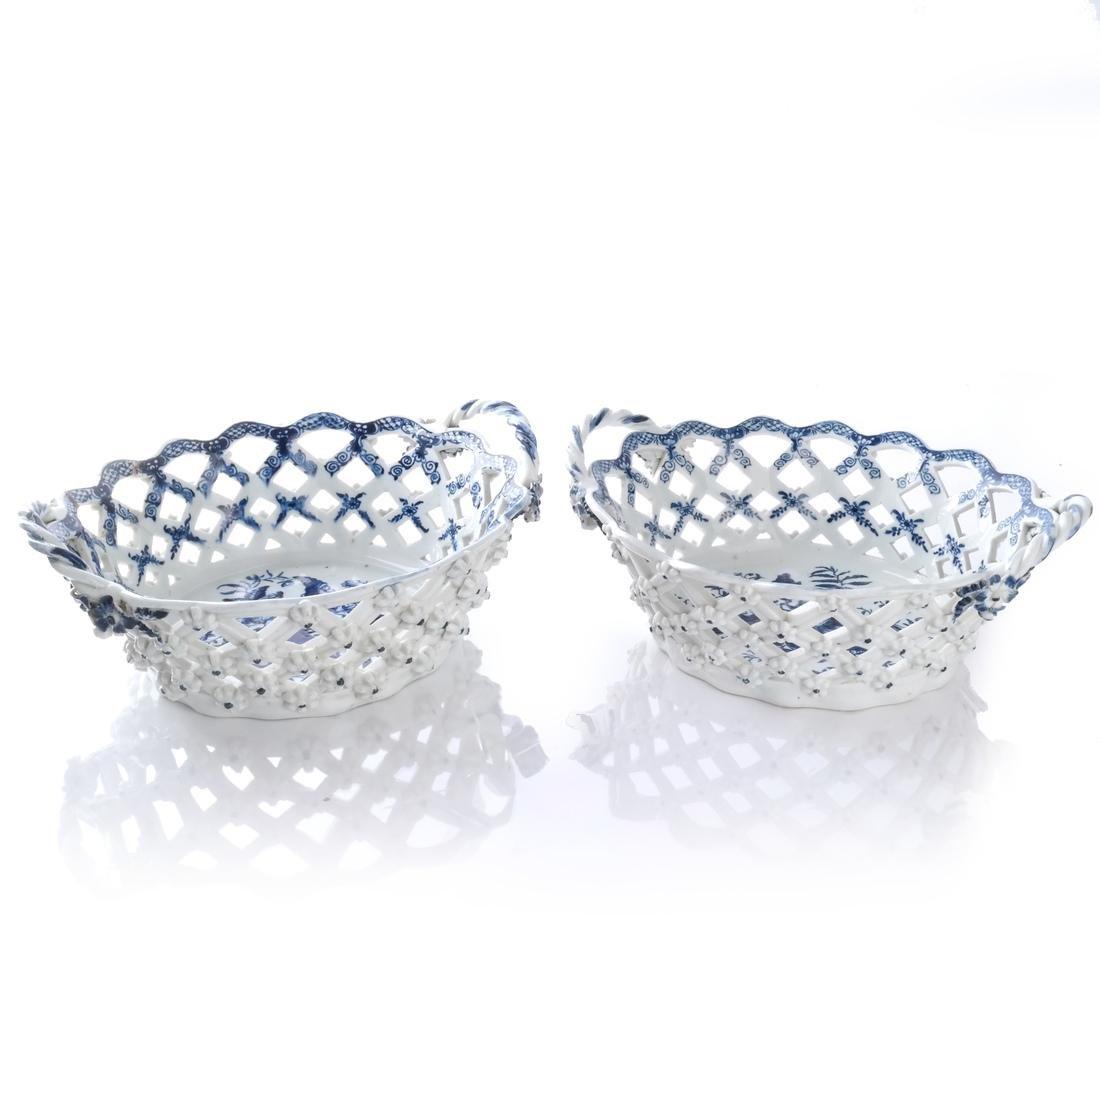 Two 18th C. English Porcelain Baskets